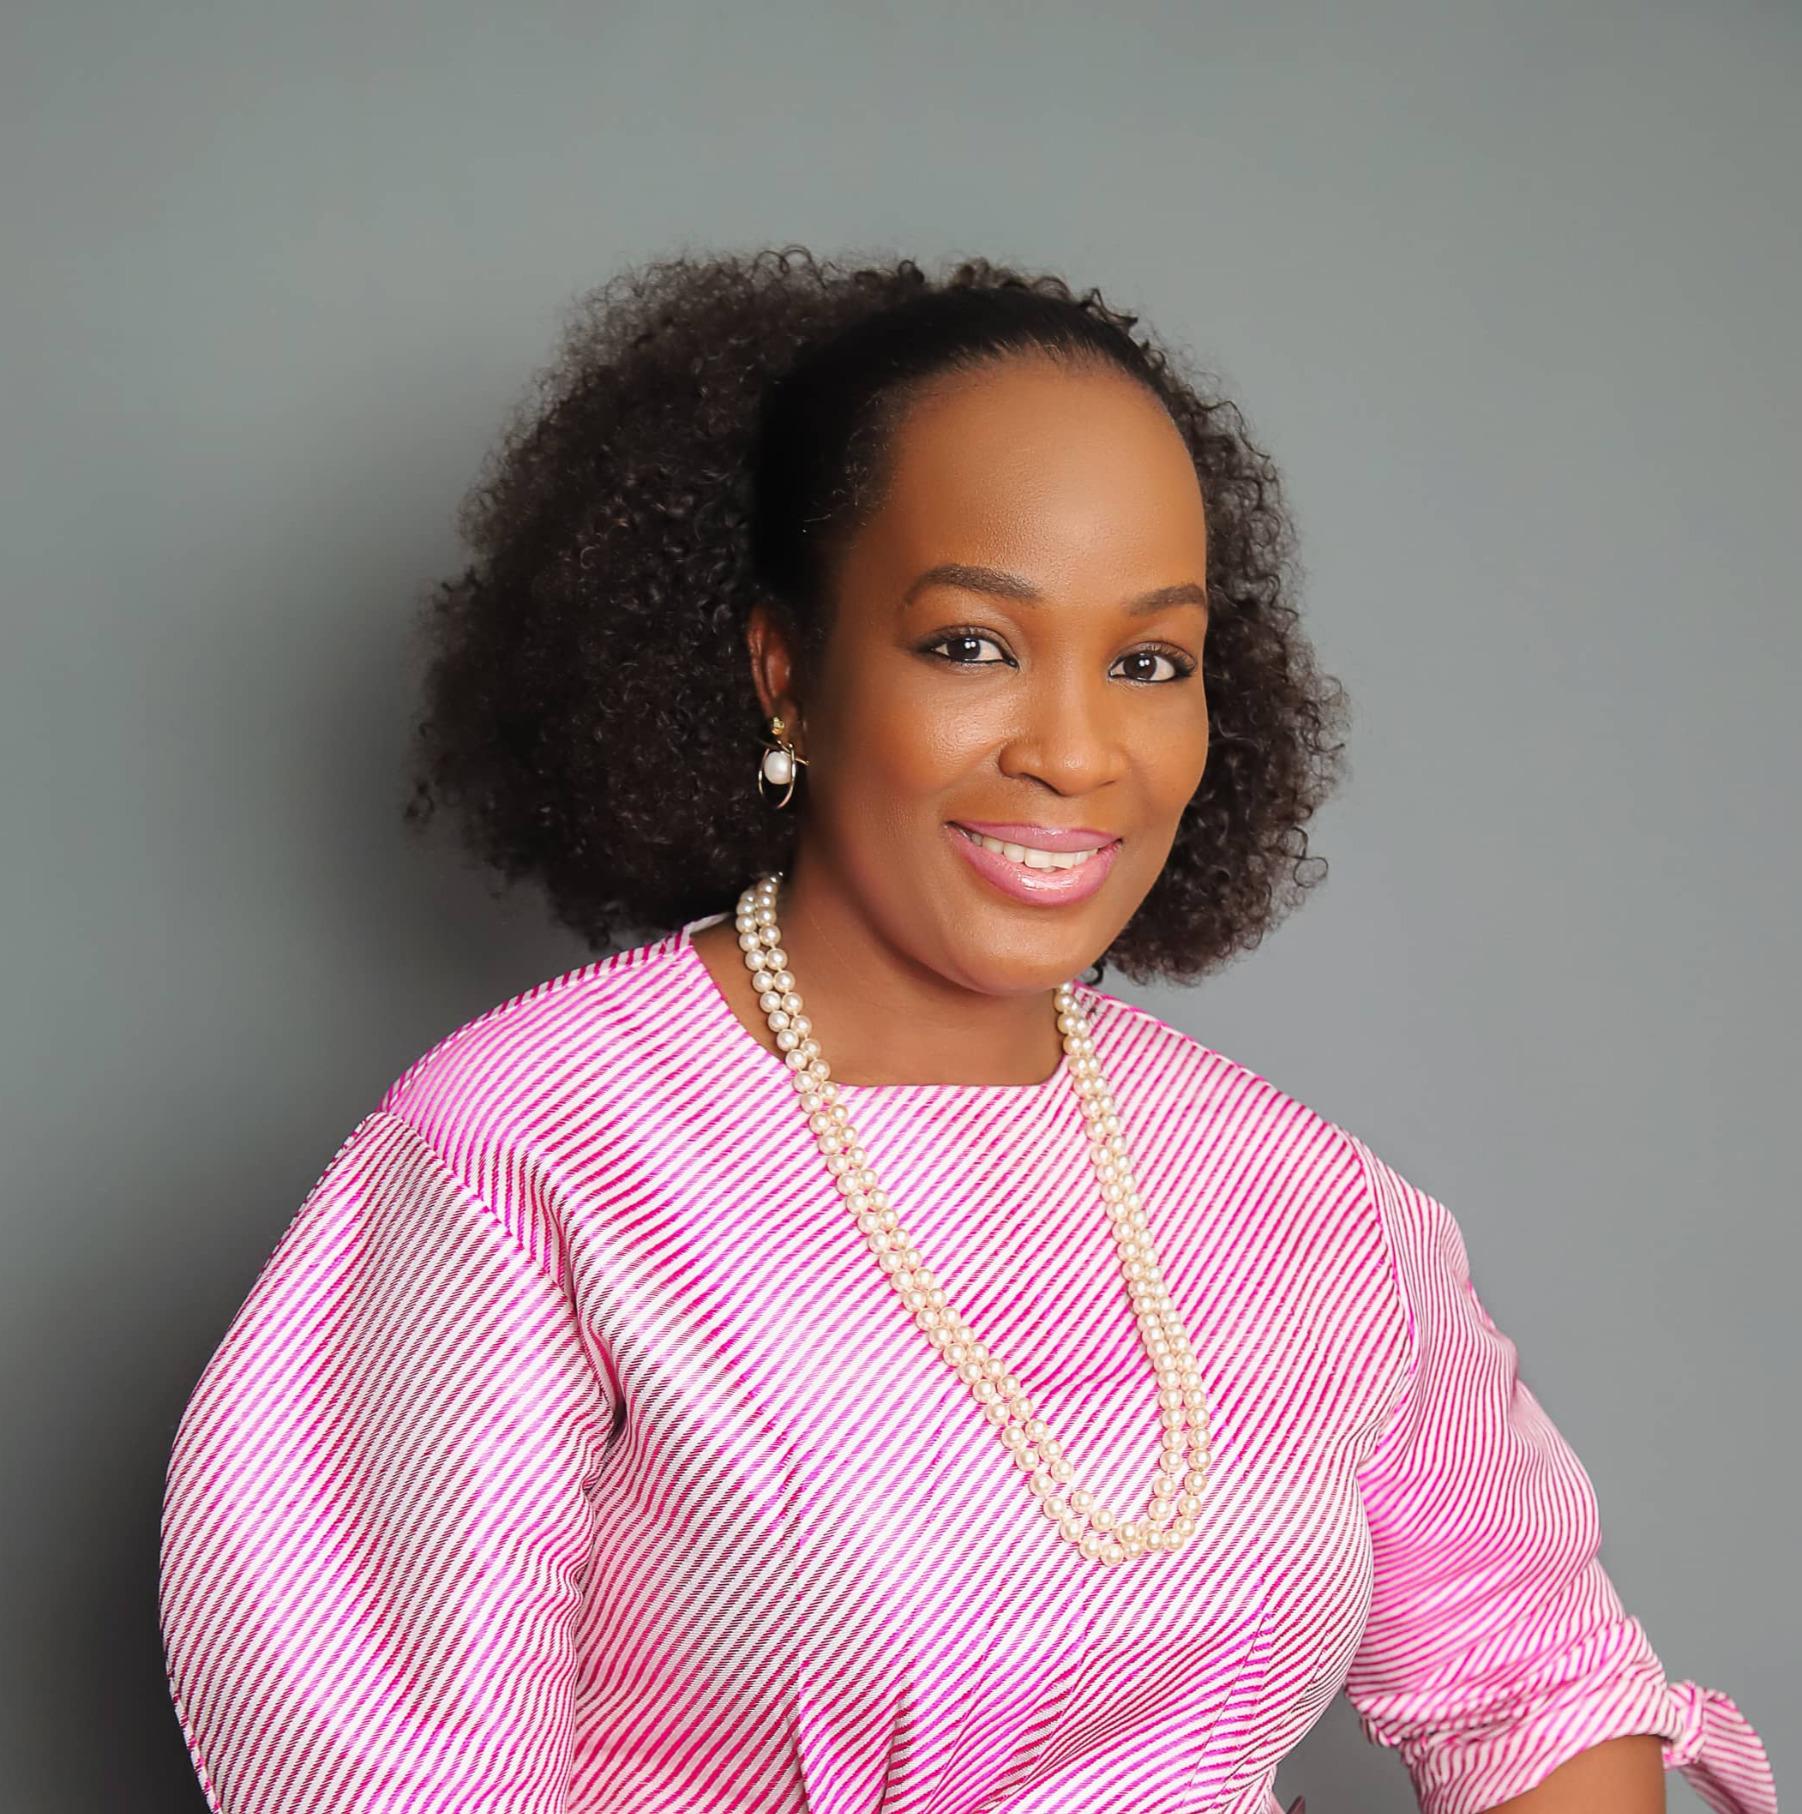 Black Skind woman